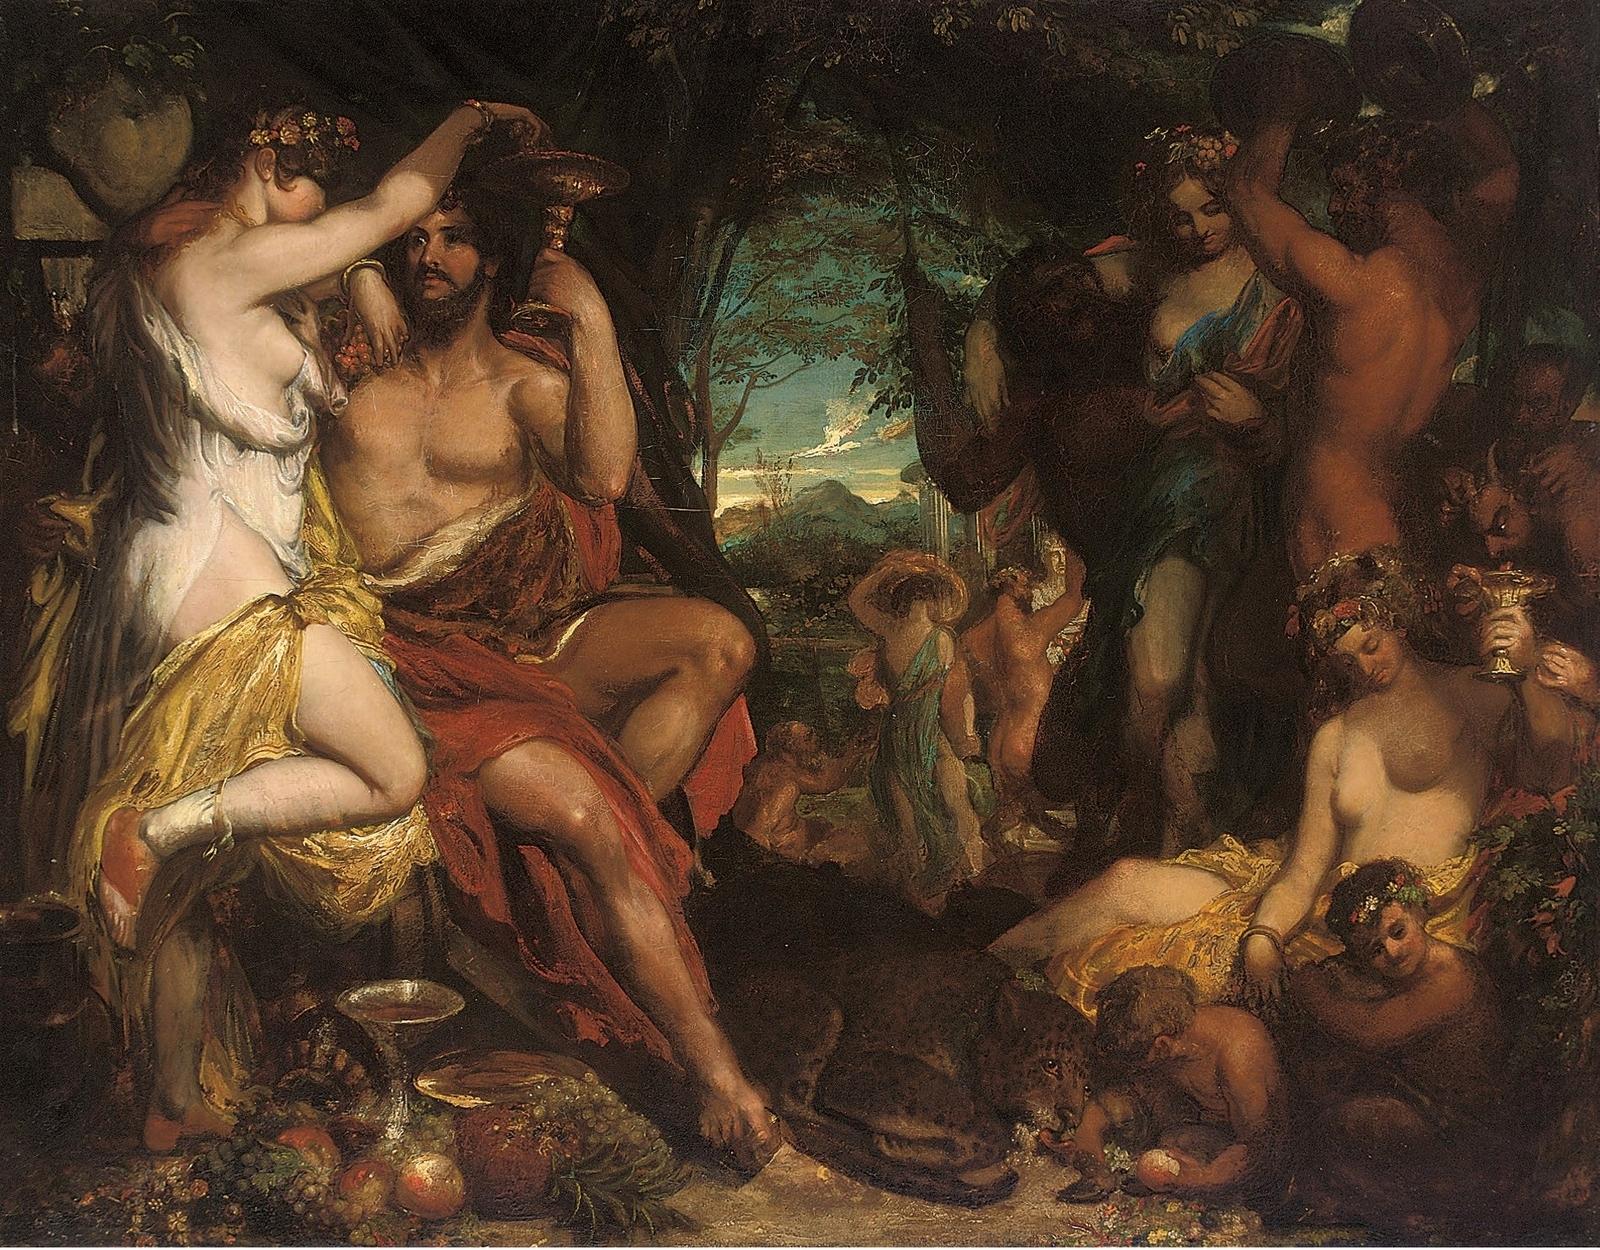 Уильям Этти. Вакханалия (A bacchanalian revel). 111 x 143.5. Холст, масло. Частное собрание.